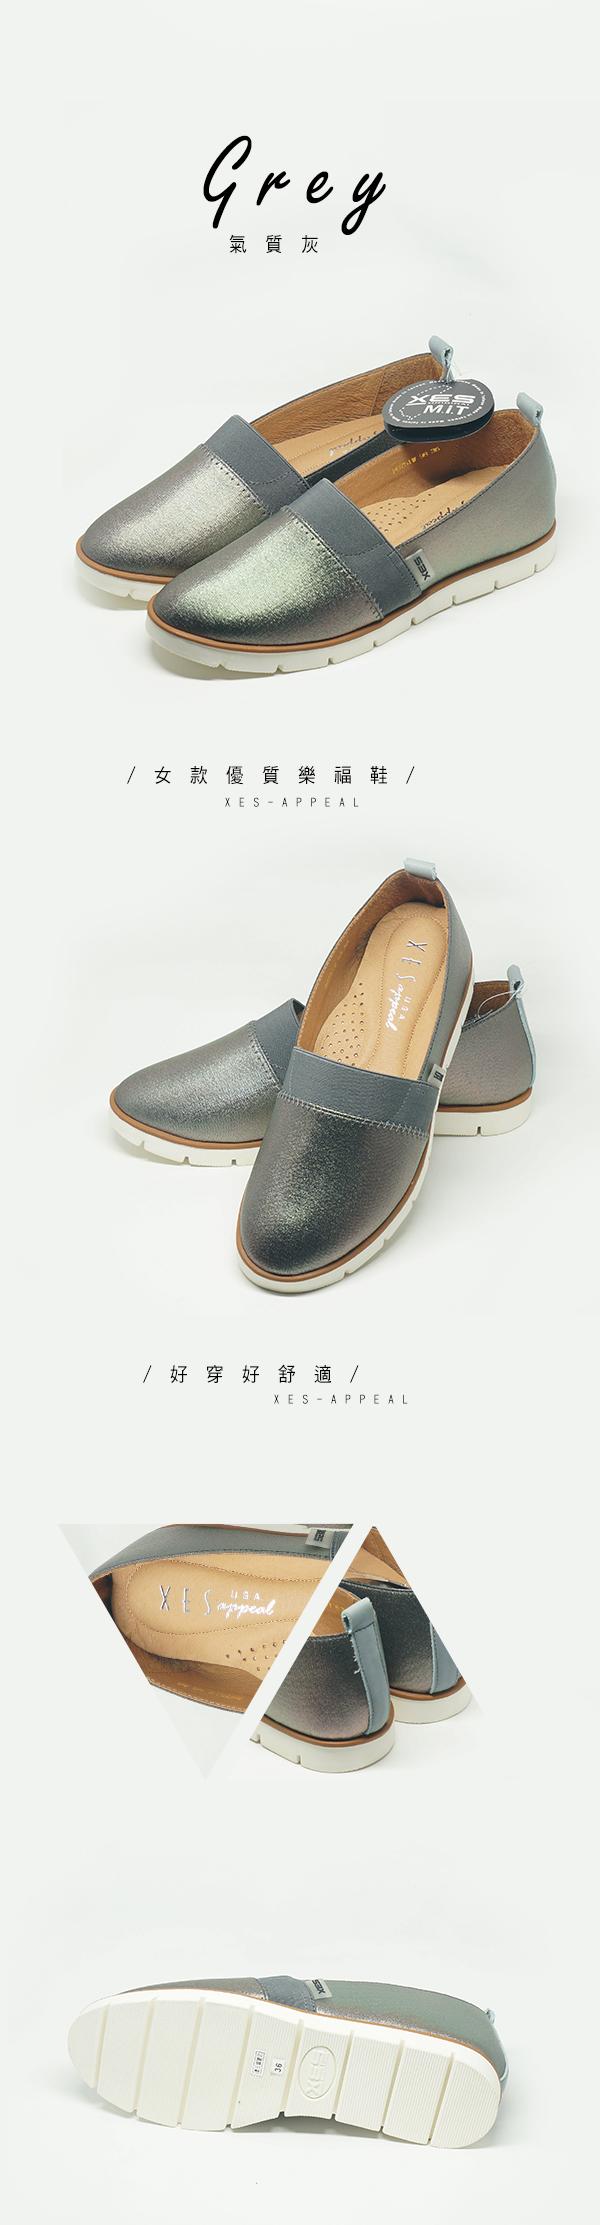 xes女鞋,此雙鞋擁有特色閃亮材質,跑趴最大引人注意閃亮閃亮顏色,足弓墊更是符合人體工學的角度,讓消費者能穿到更符貼的鞋墊,